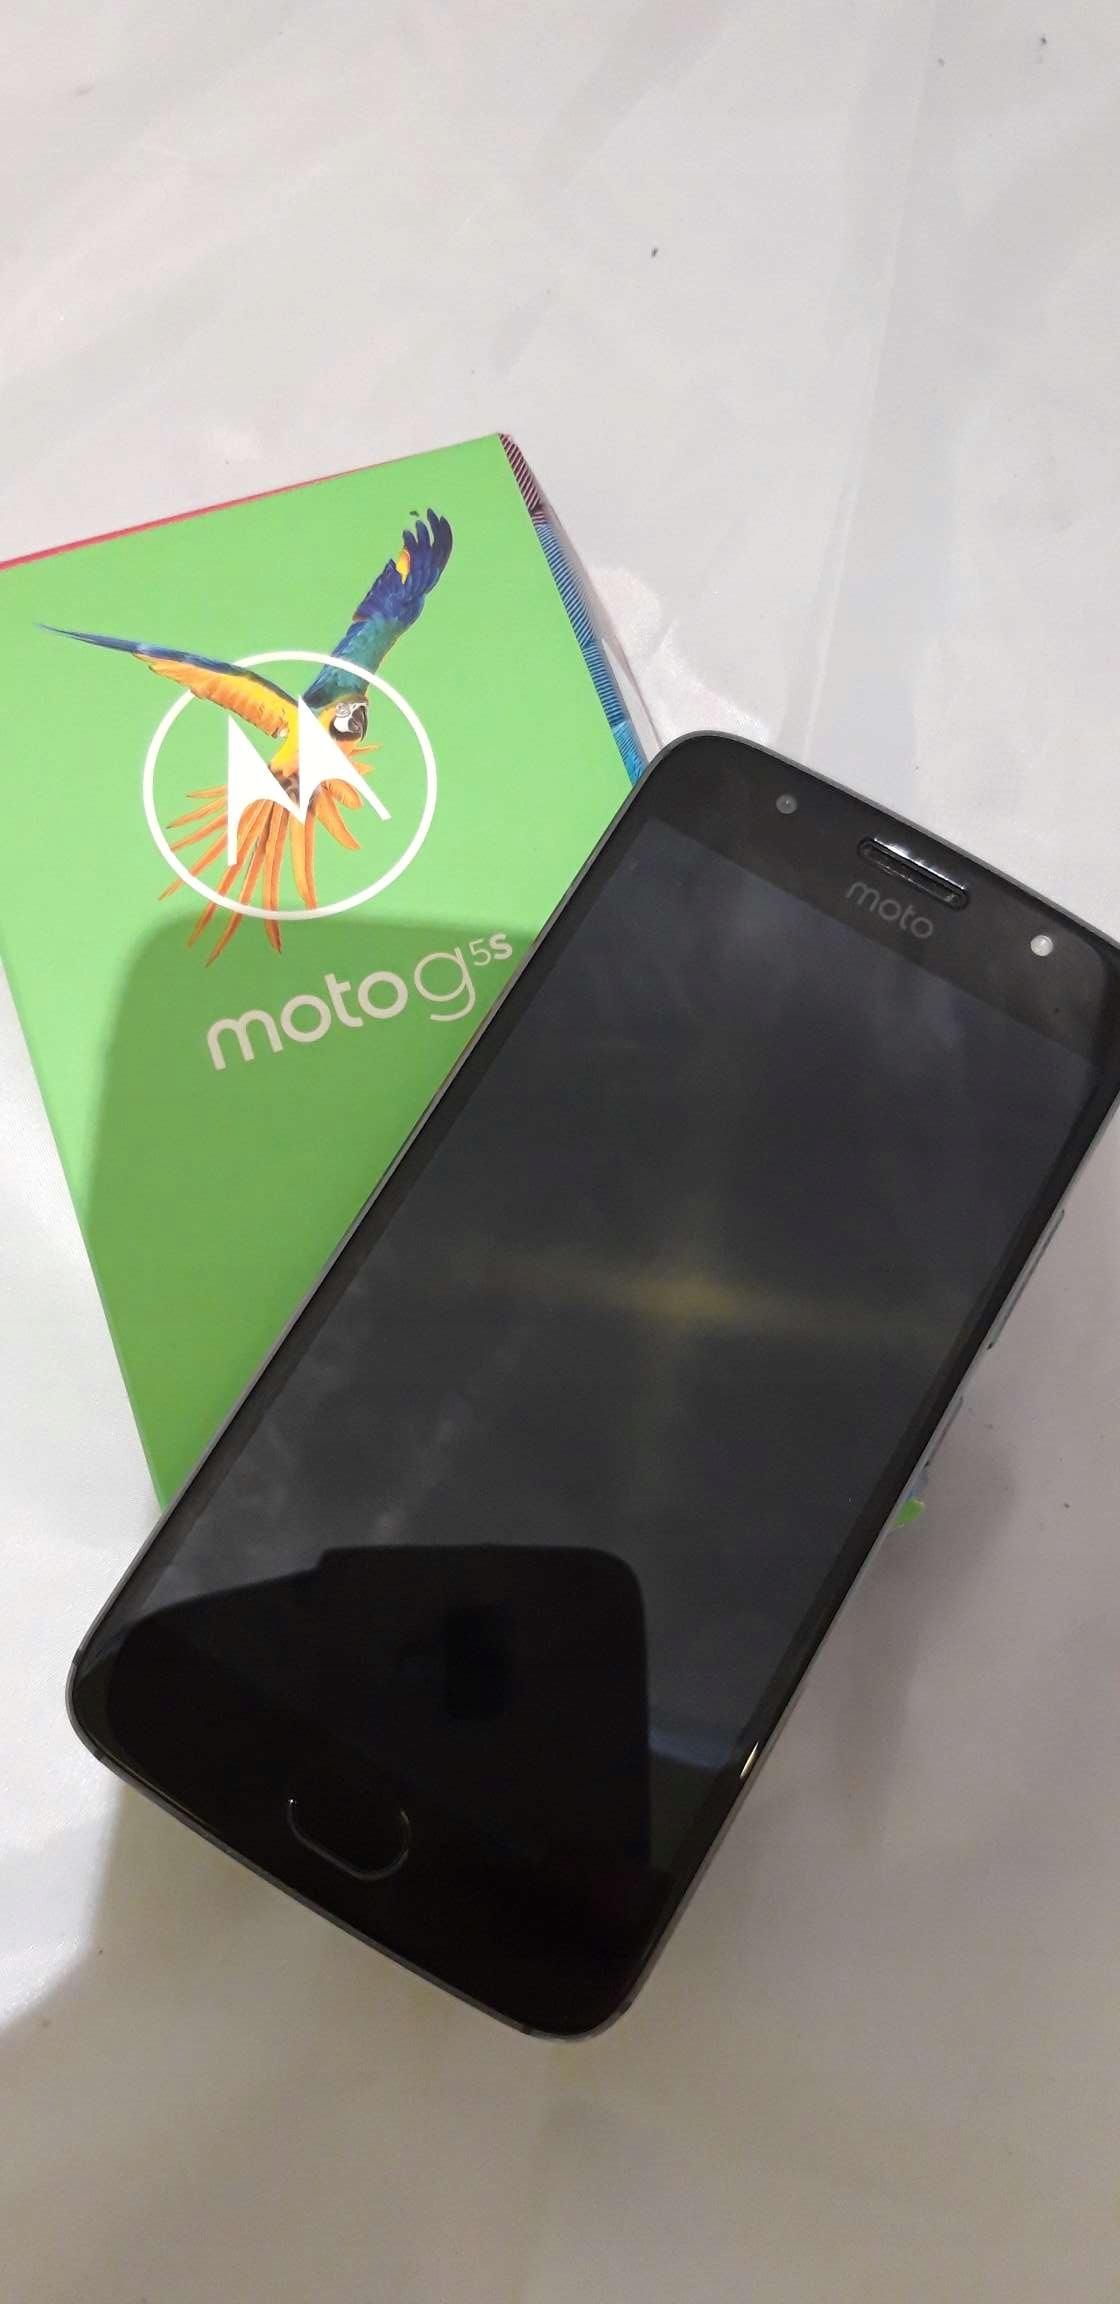 TELEFON MOTOROLA MOTO 5S 32 GB PUDEŁKO ŁADOWARKA